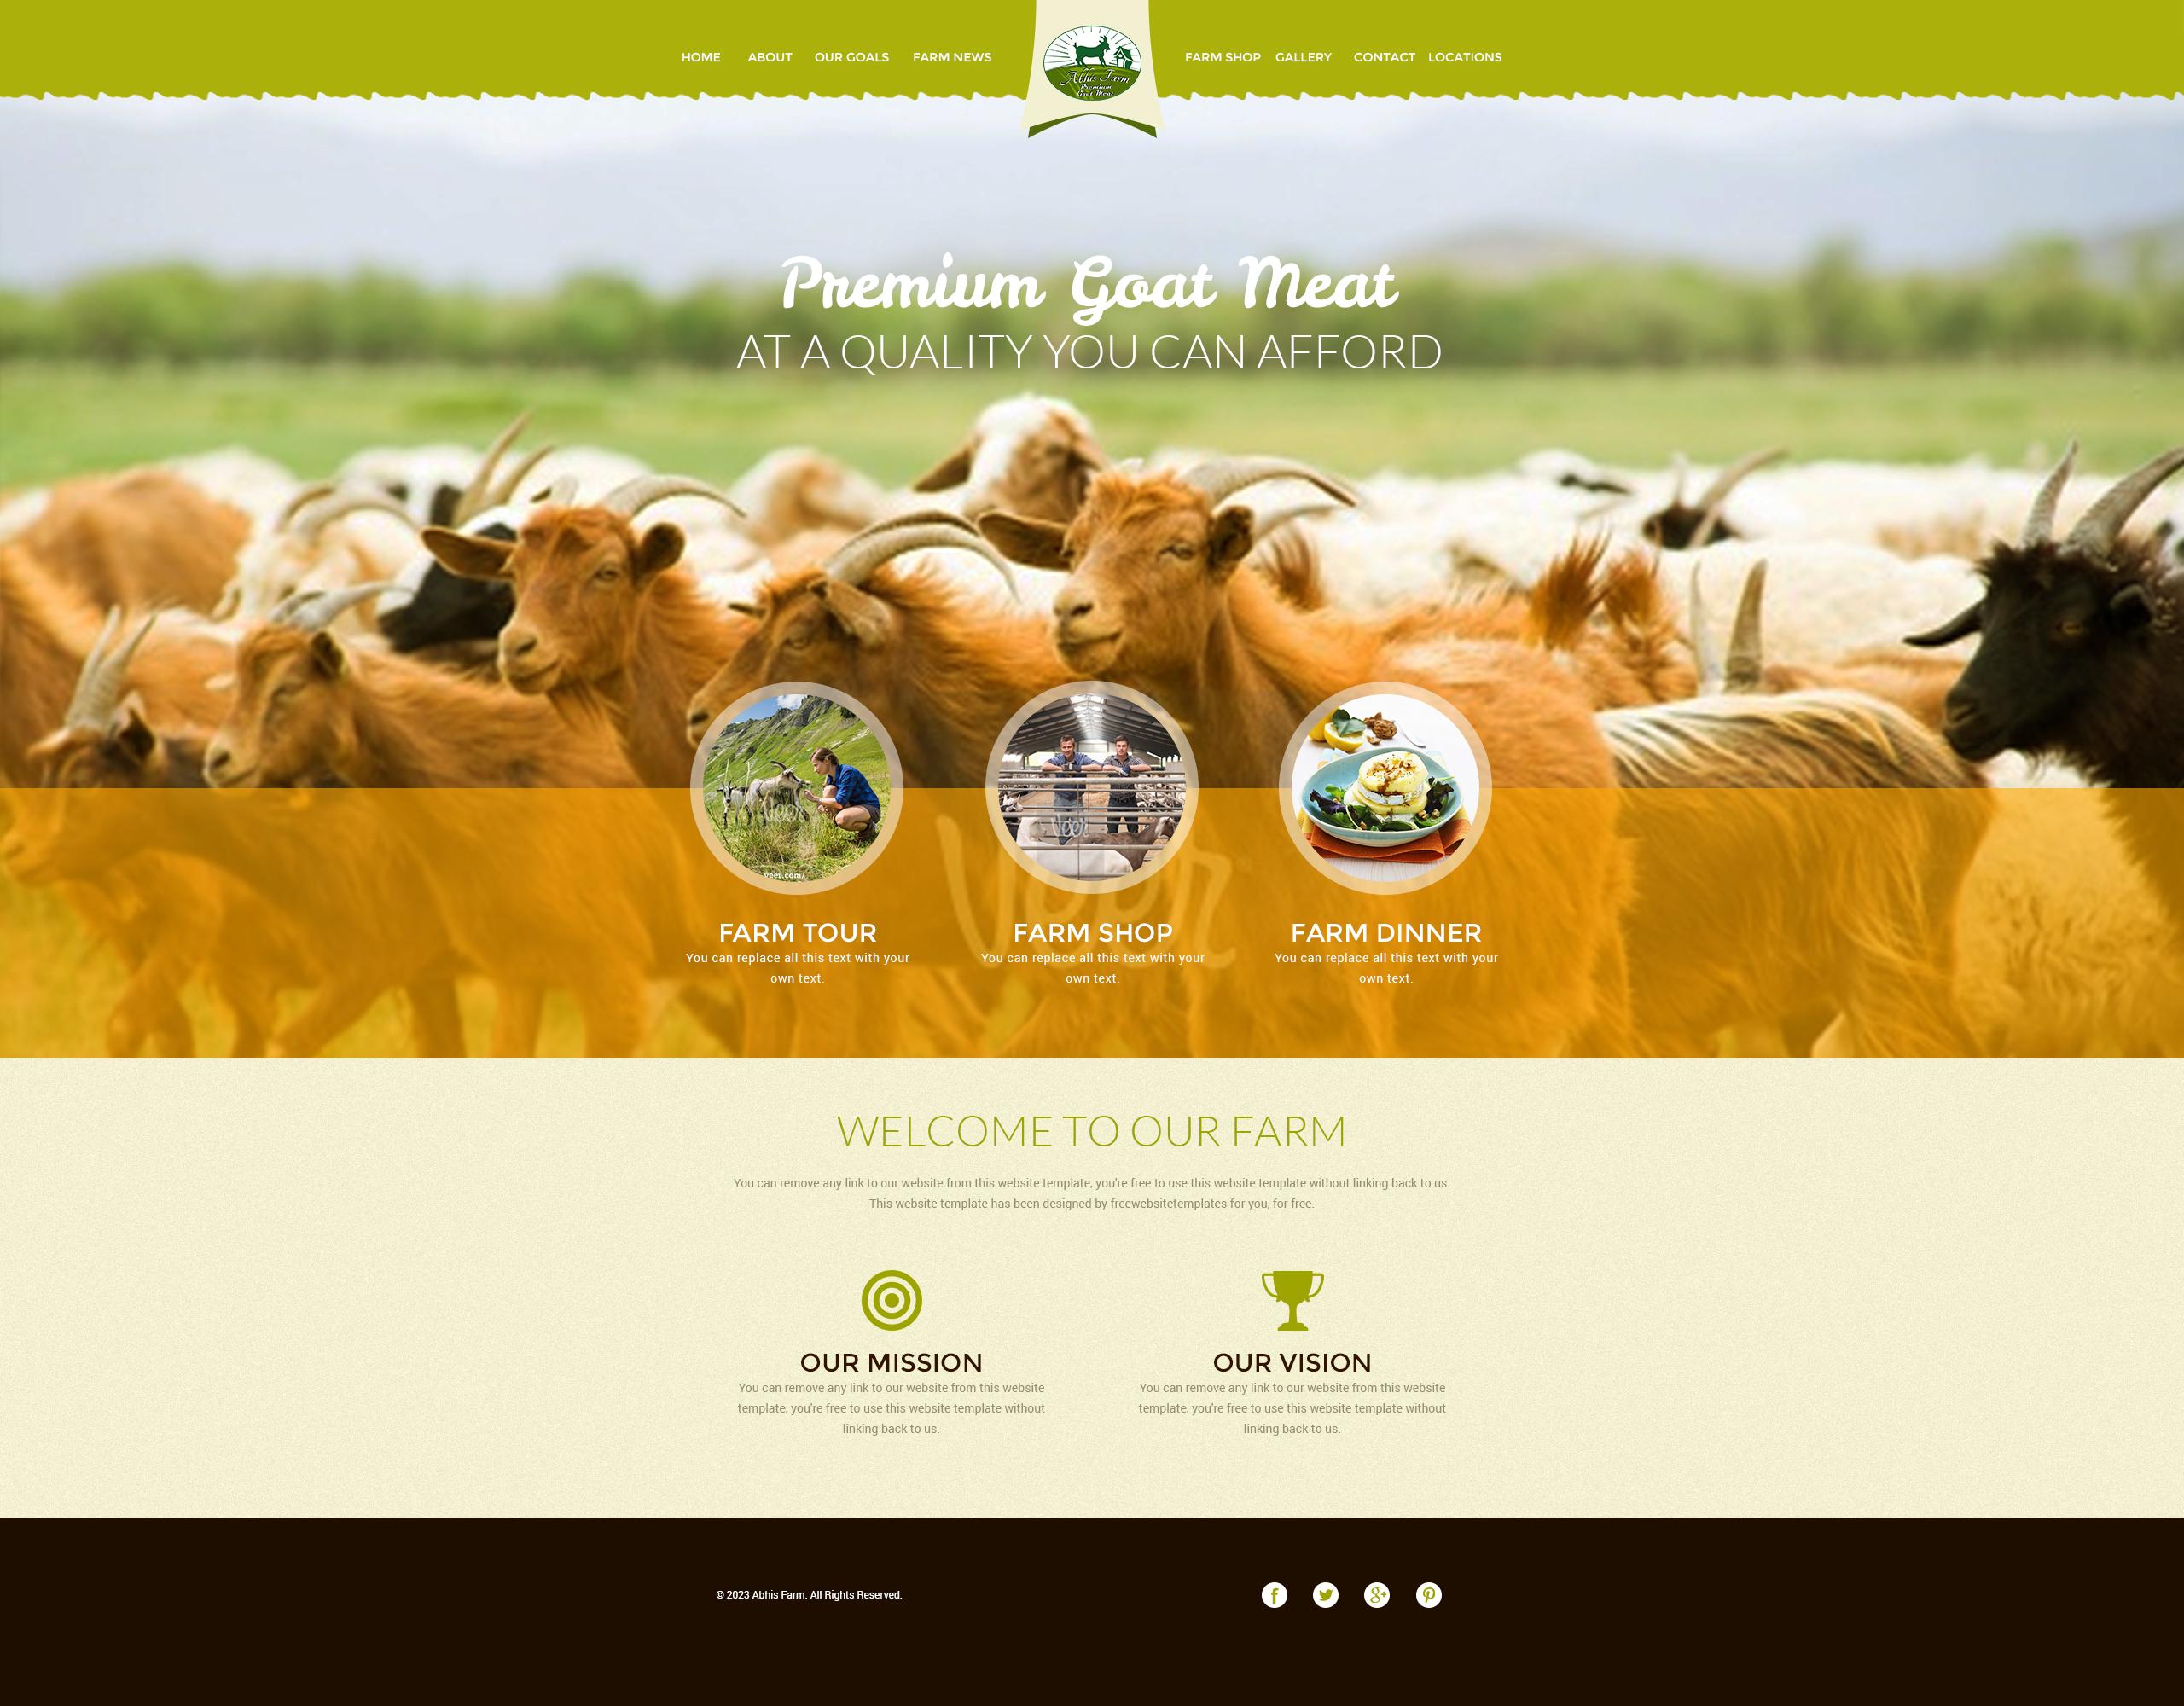 001-Goat Farm1.jpg